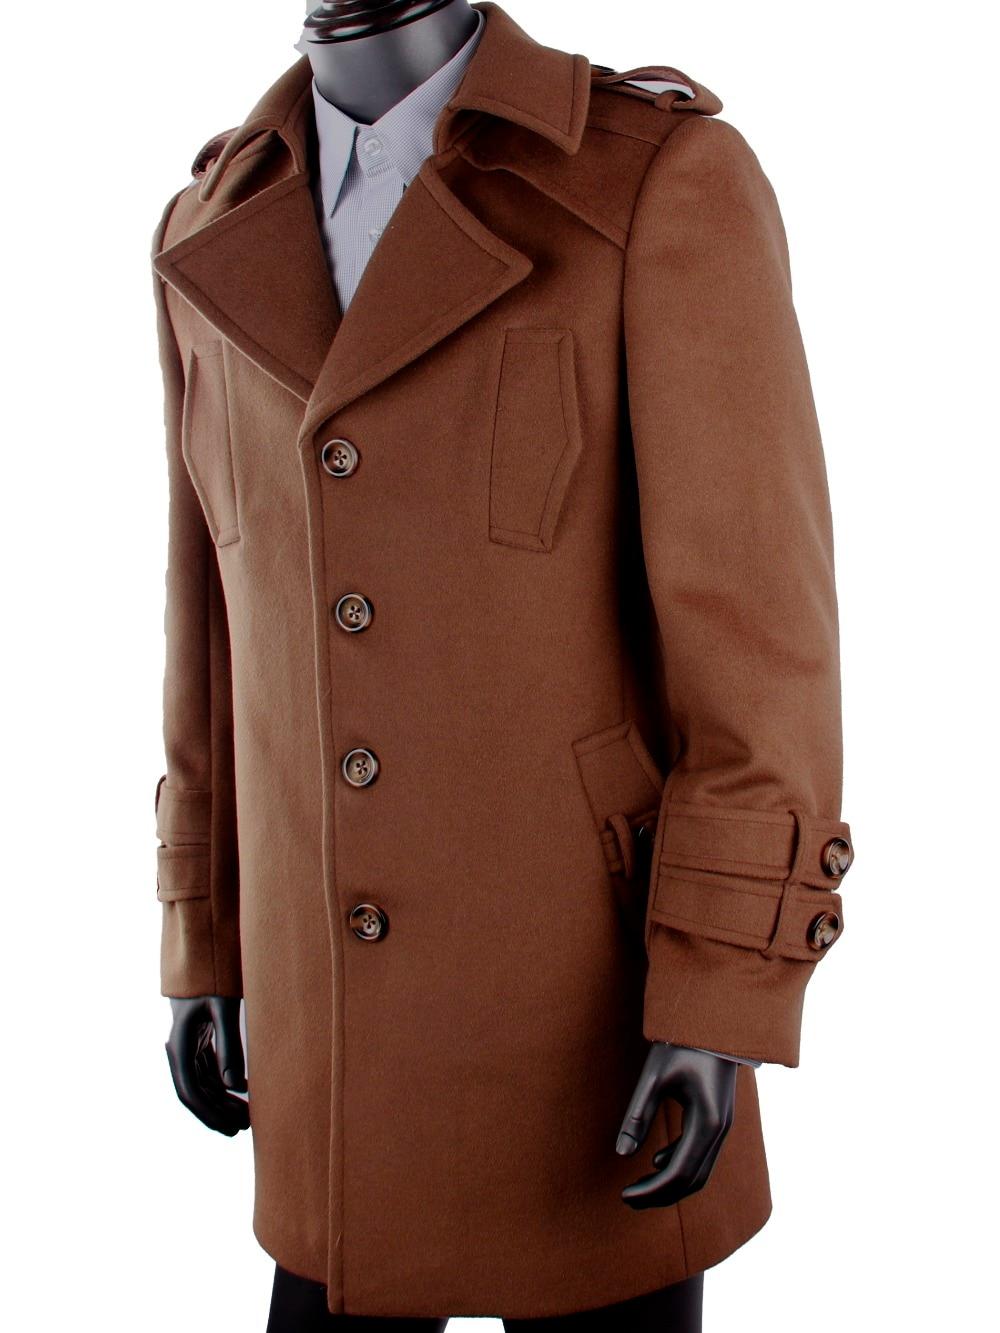 5dark Coats Blends Overcoat Custom Long Inamp; Coat Made Single Brown Men Winter Breasted Us179 CoatCashmere Wool For FKJT1lc3u5